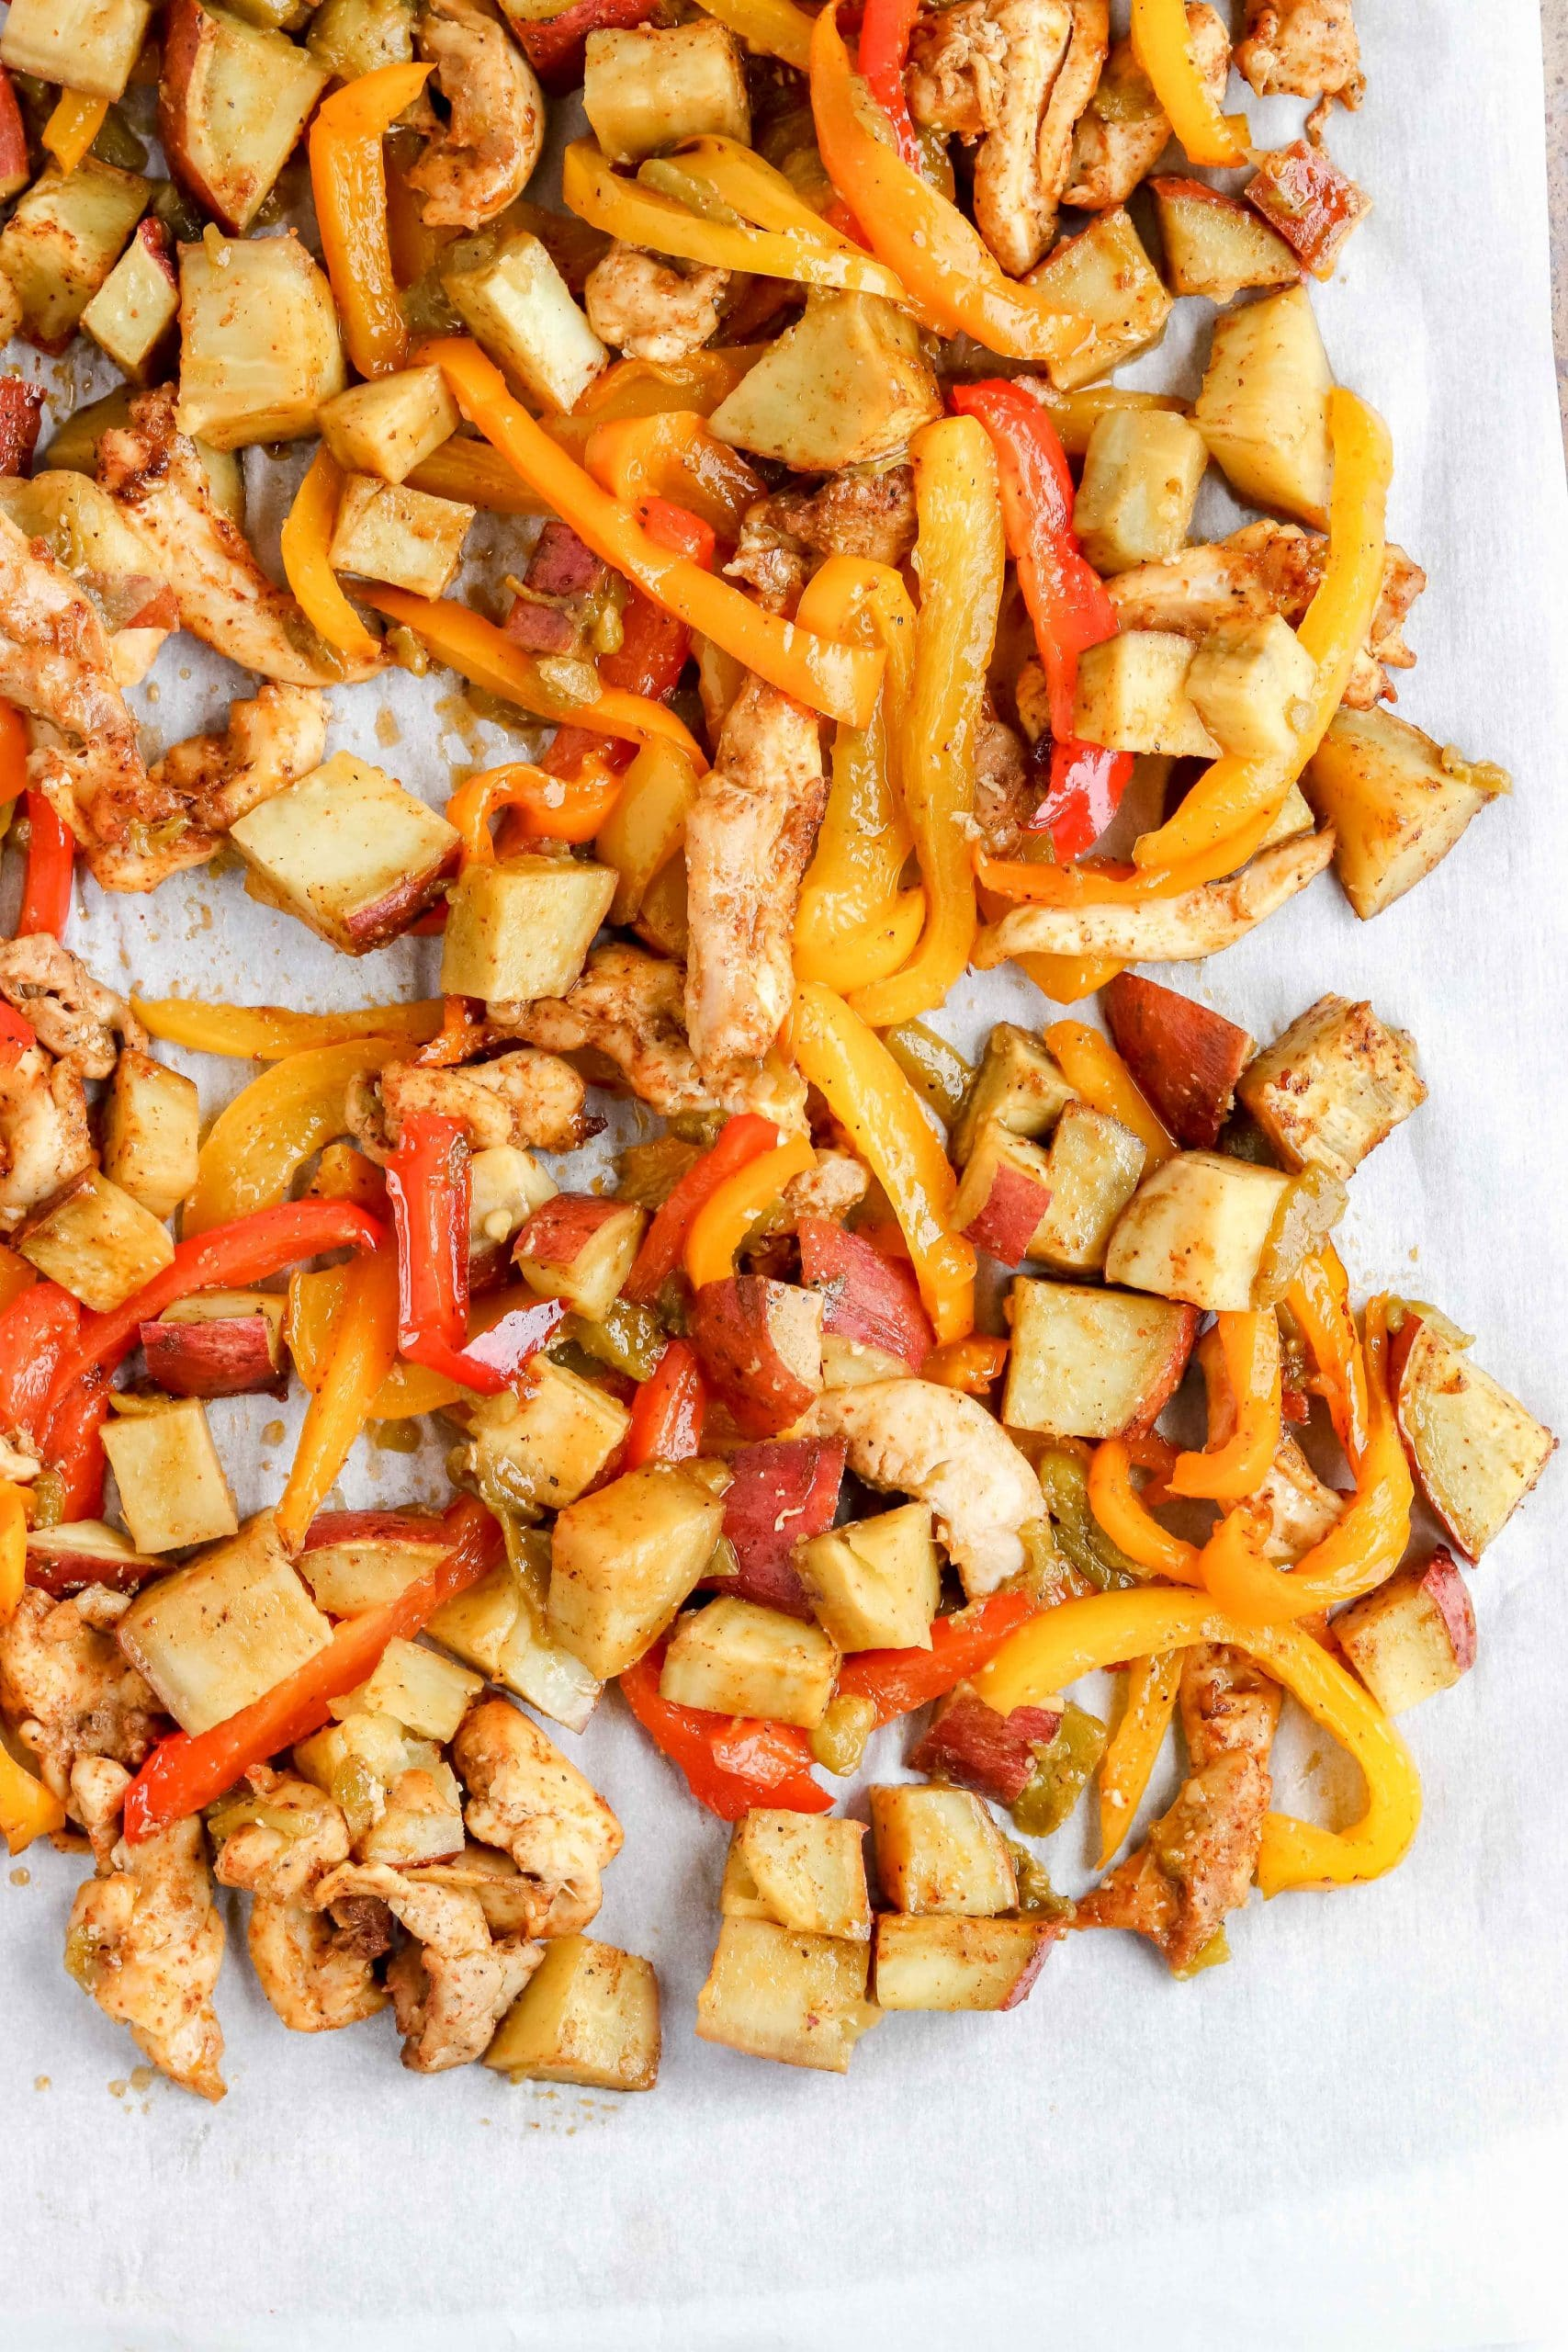 Fajita Sheet Pan with Chicken, Peppers and Sweet Potatoes. https://www.atwistedplate.com/fajita-sweet-potato-sheet-pan-dinner/